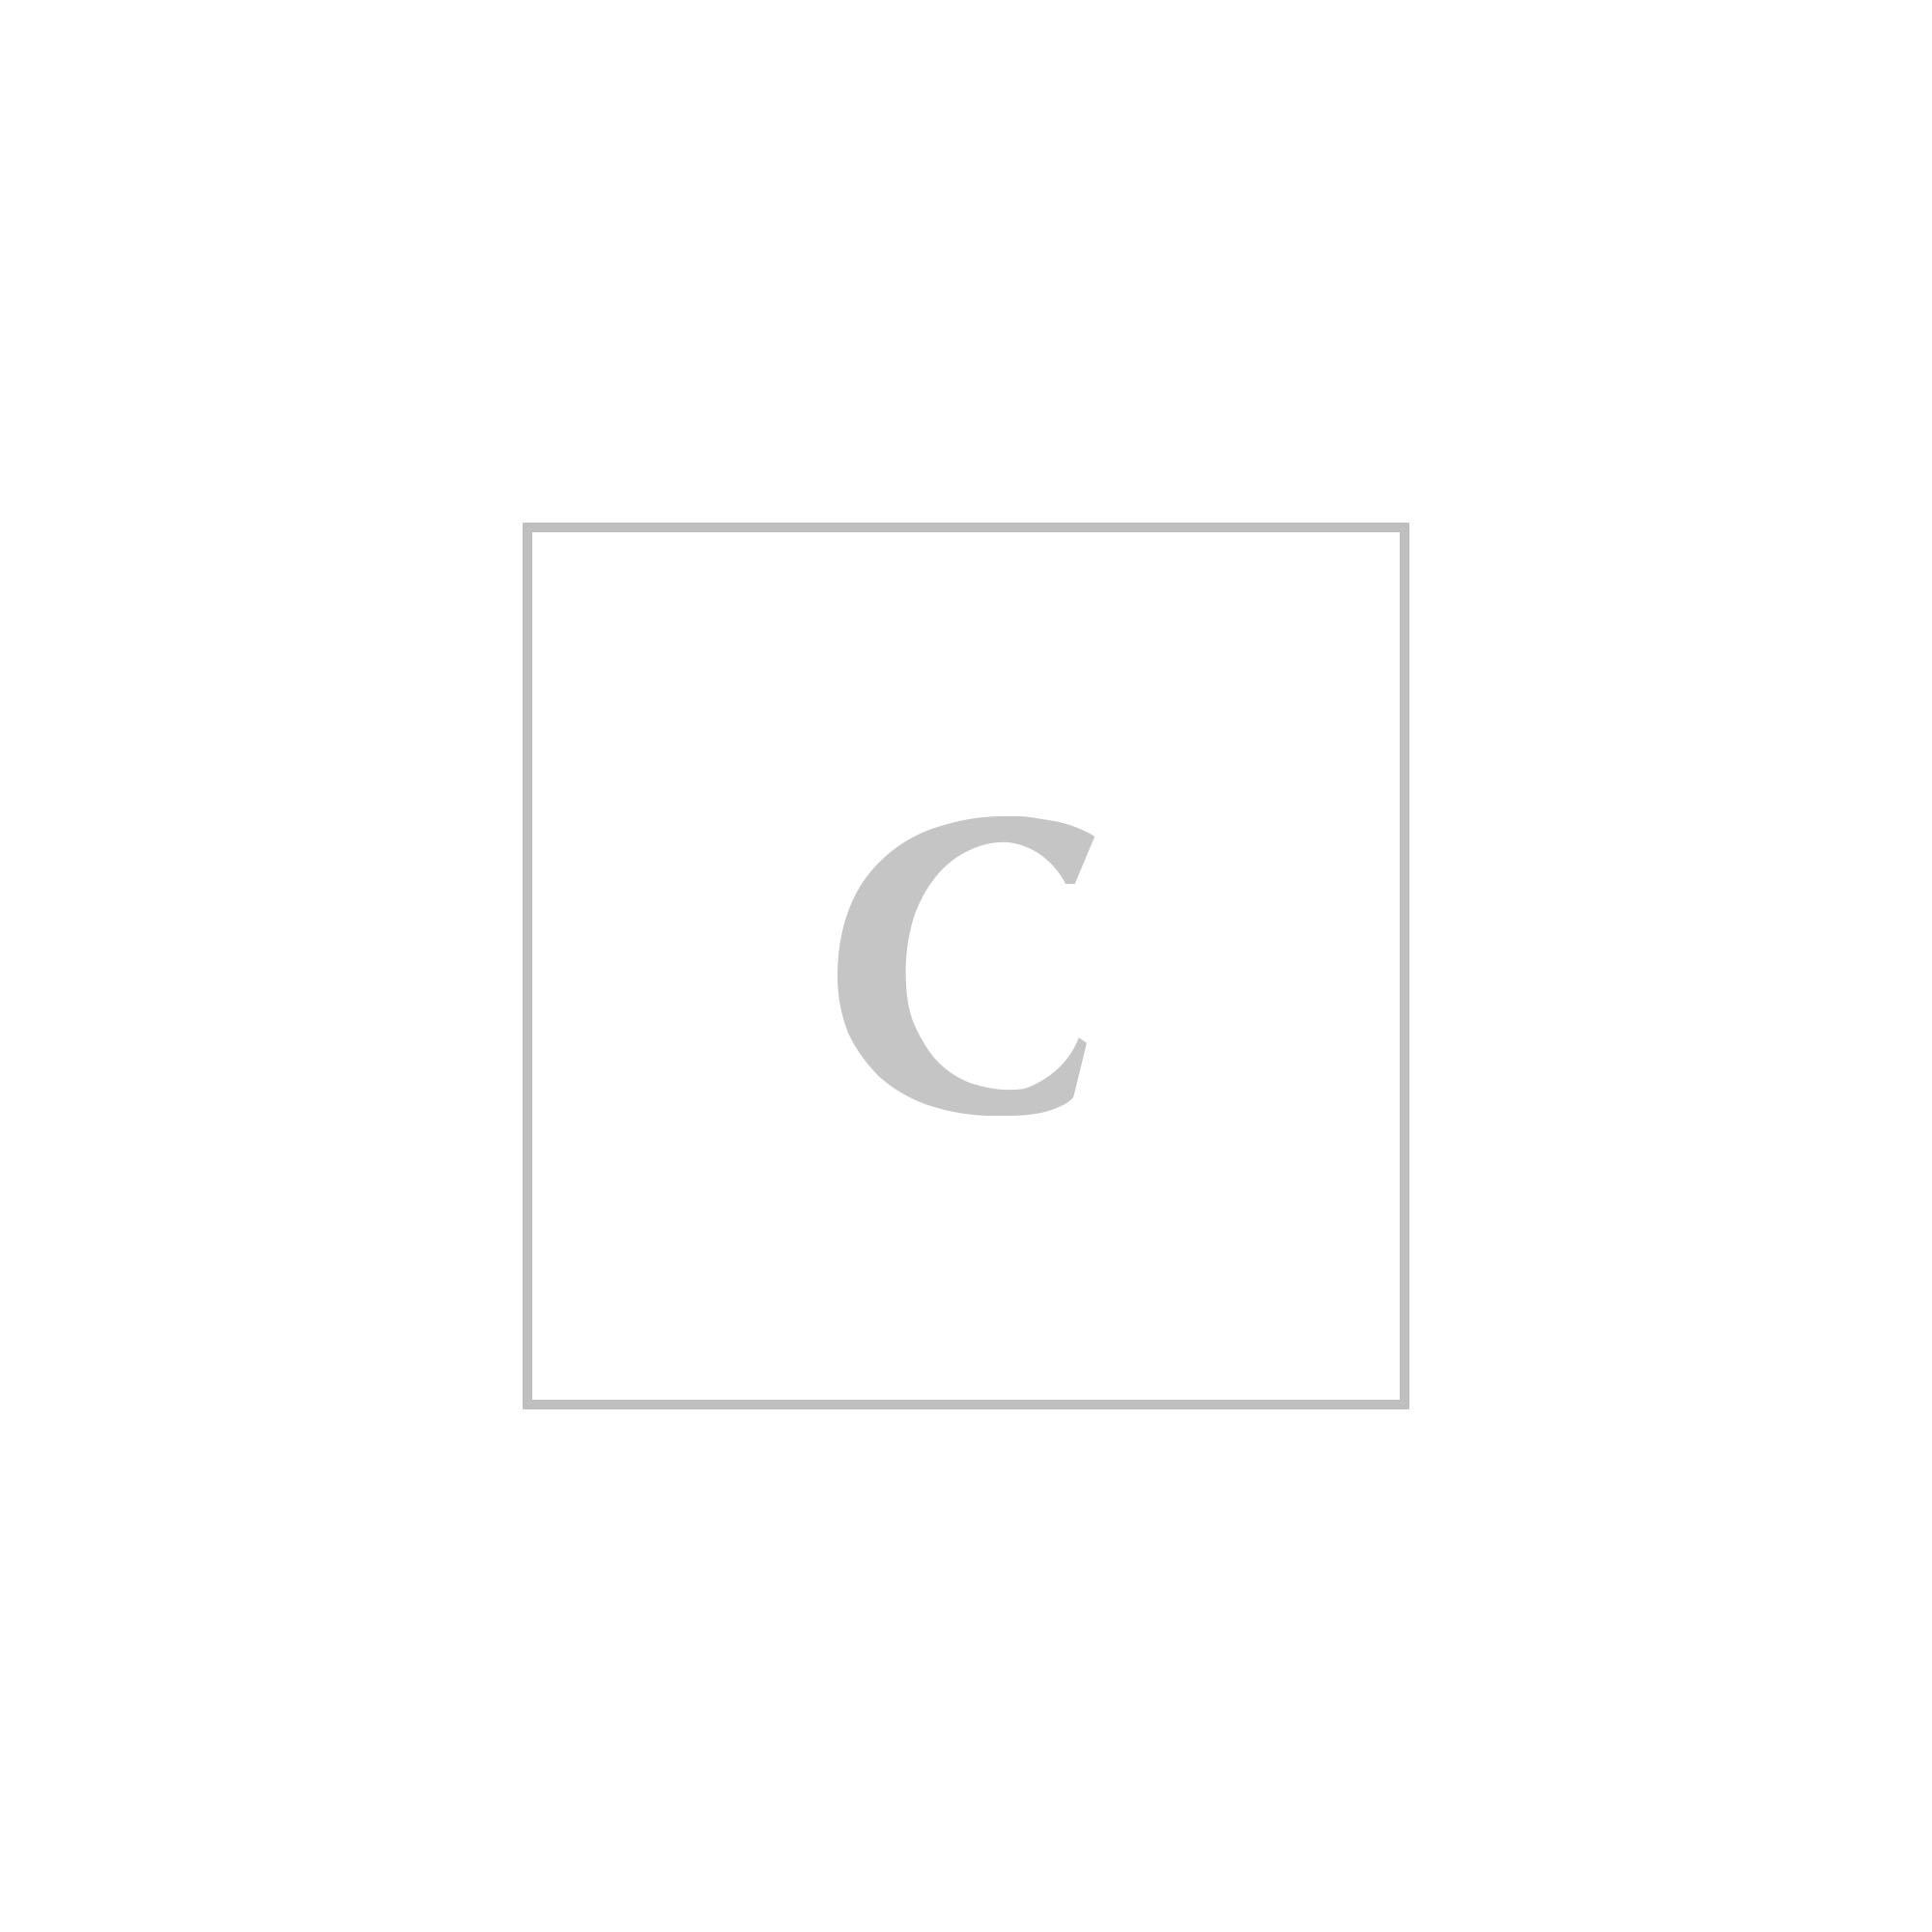 Saint laurent ysl monogram bag